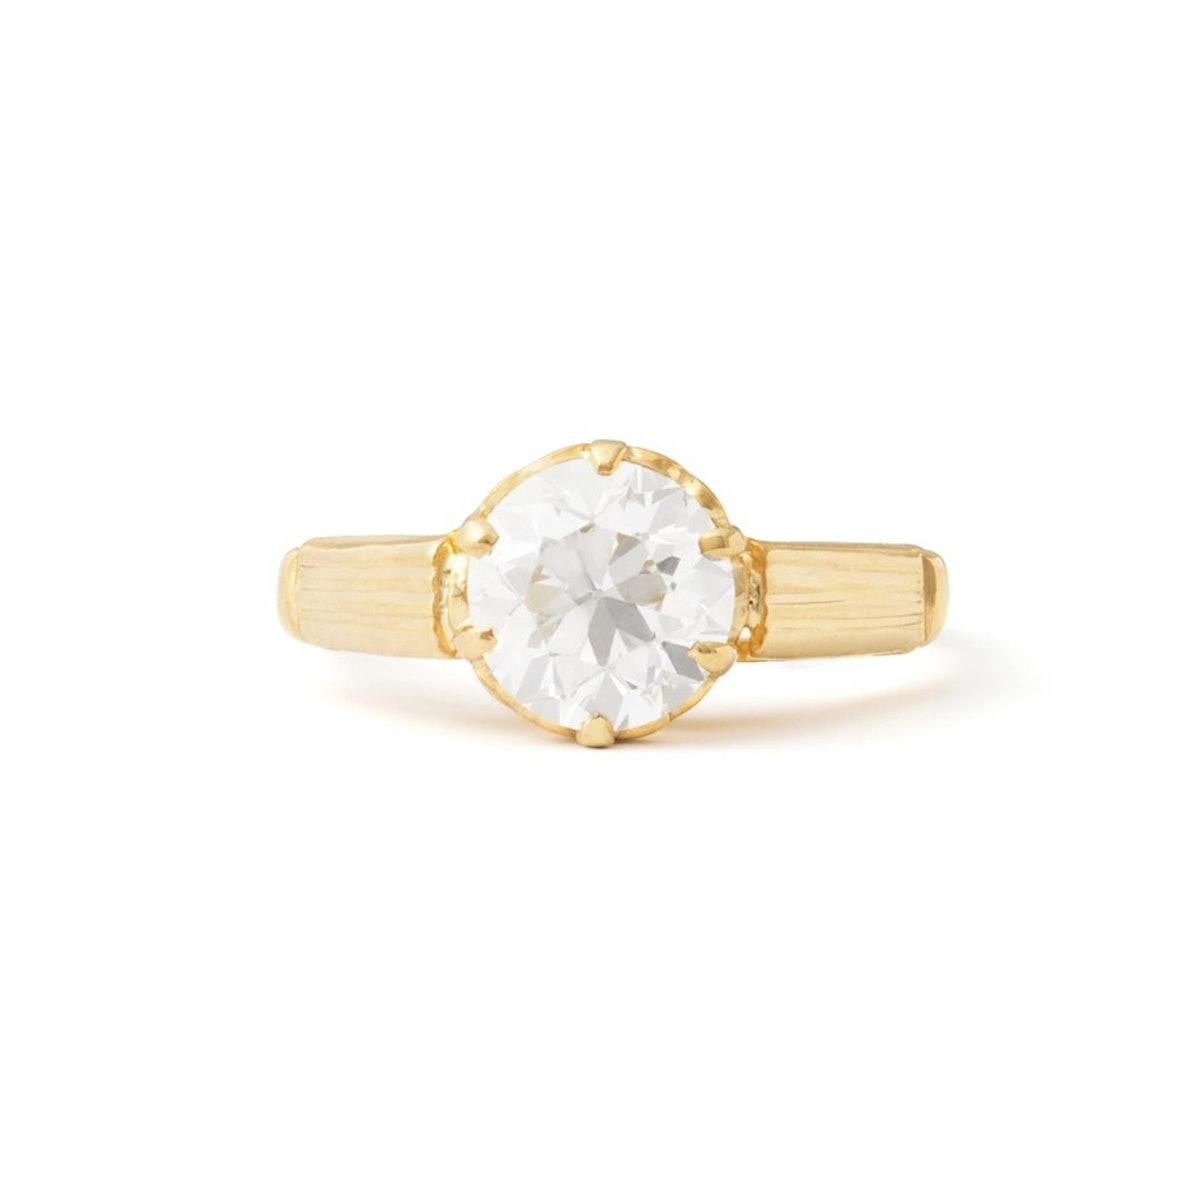 Arts & Crafts 1.60 Carat Old European Cut Diamond Ring in 14k yellow gold from Fox & Bond.